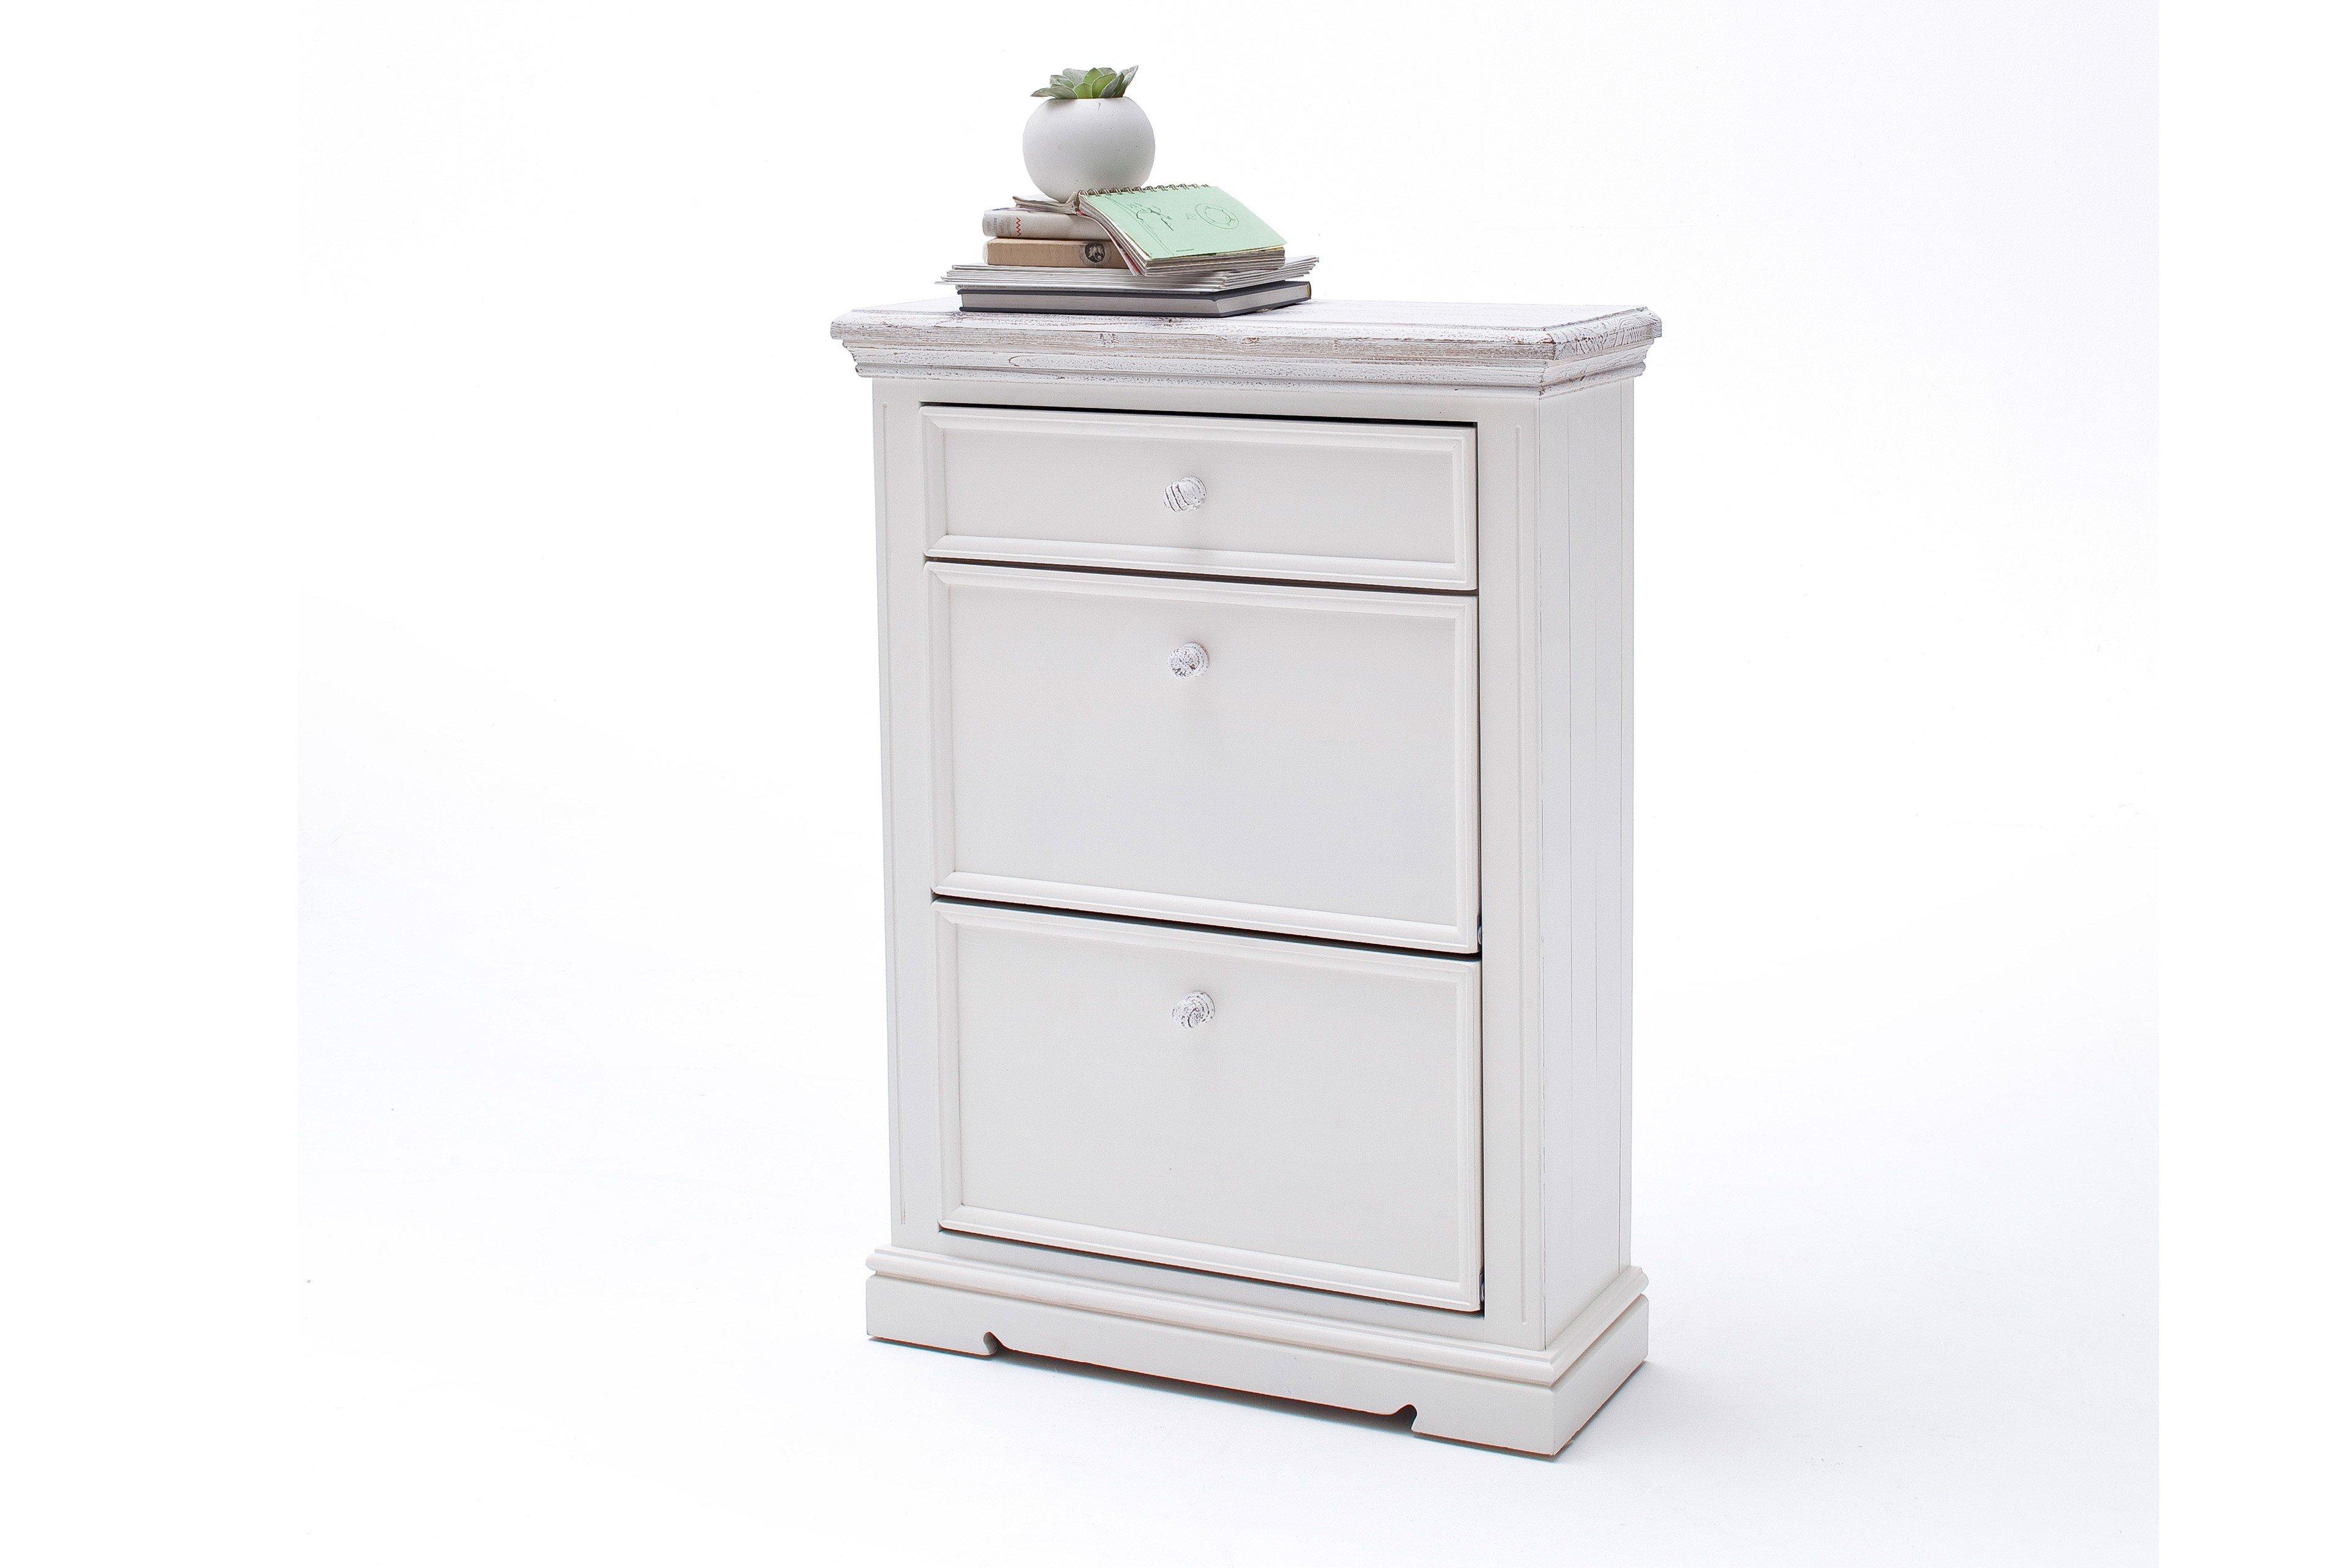 Schuhschrank Osita Kiefer weiß/ teil-massiv - MCA furniture   Möbel ...